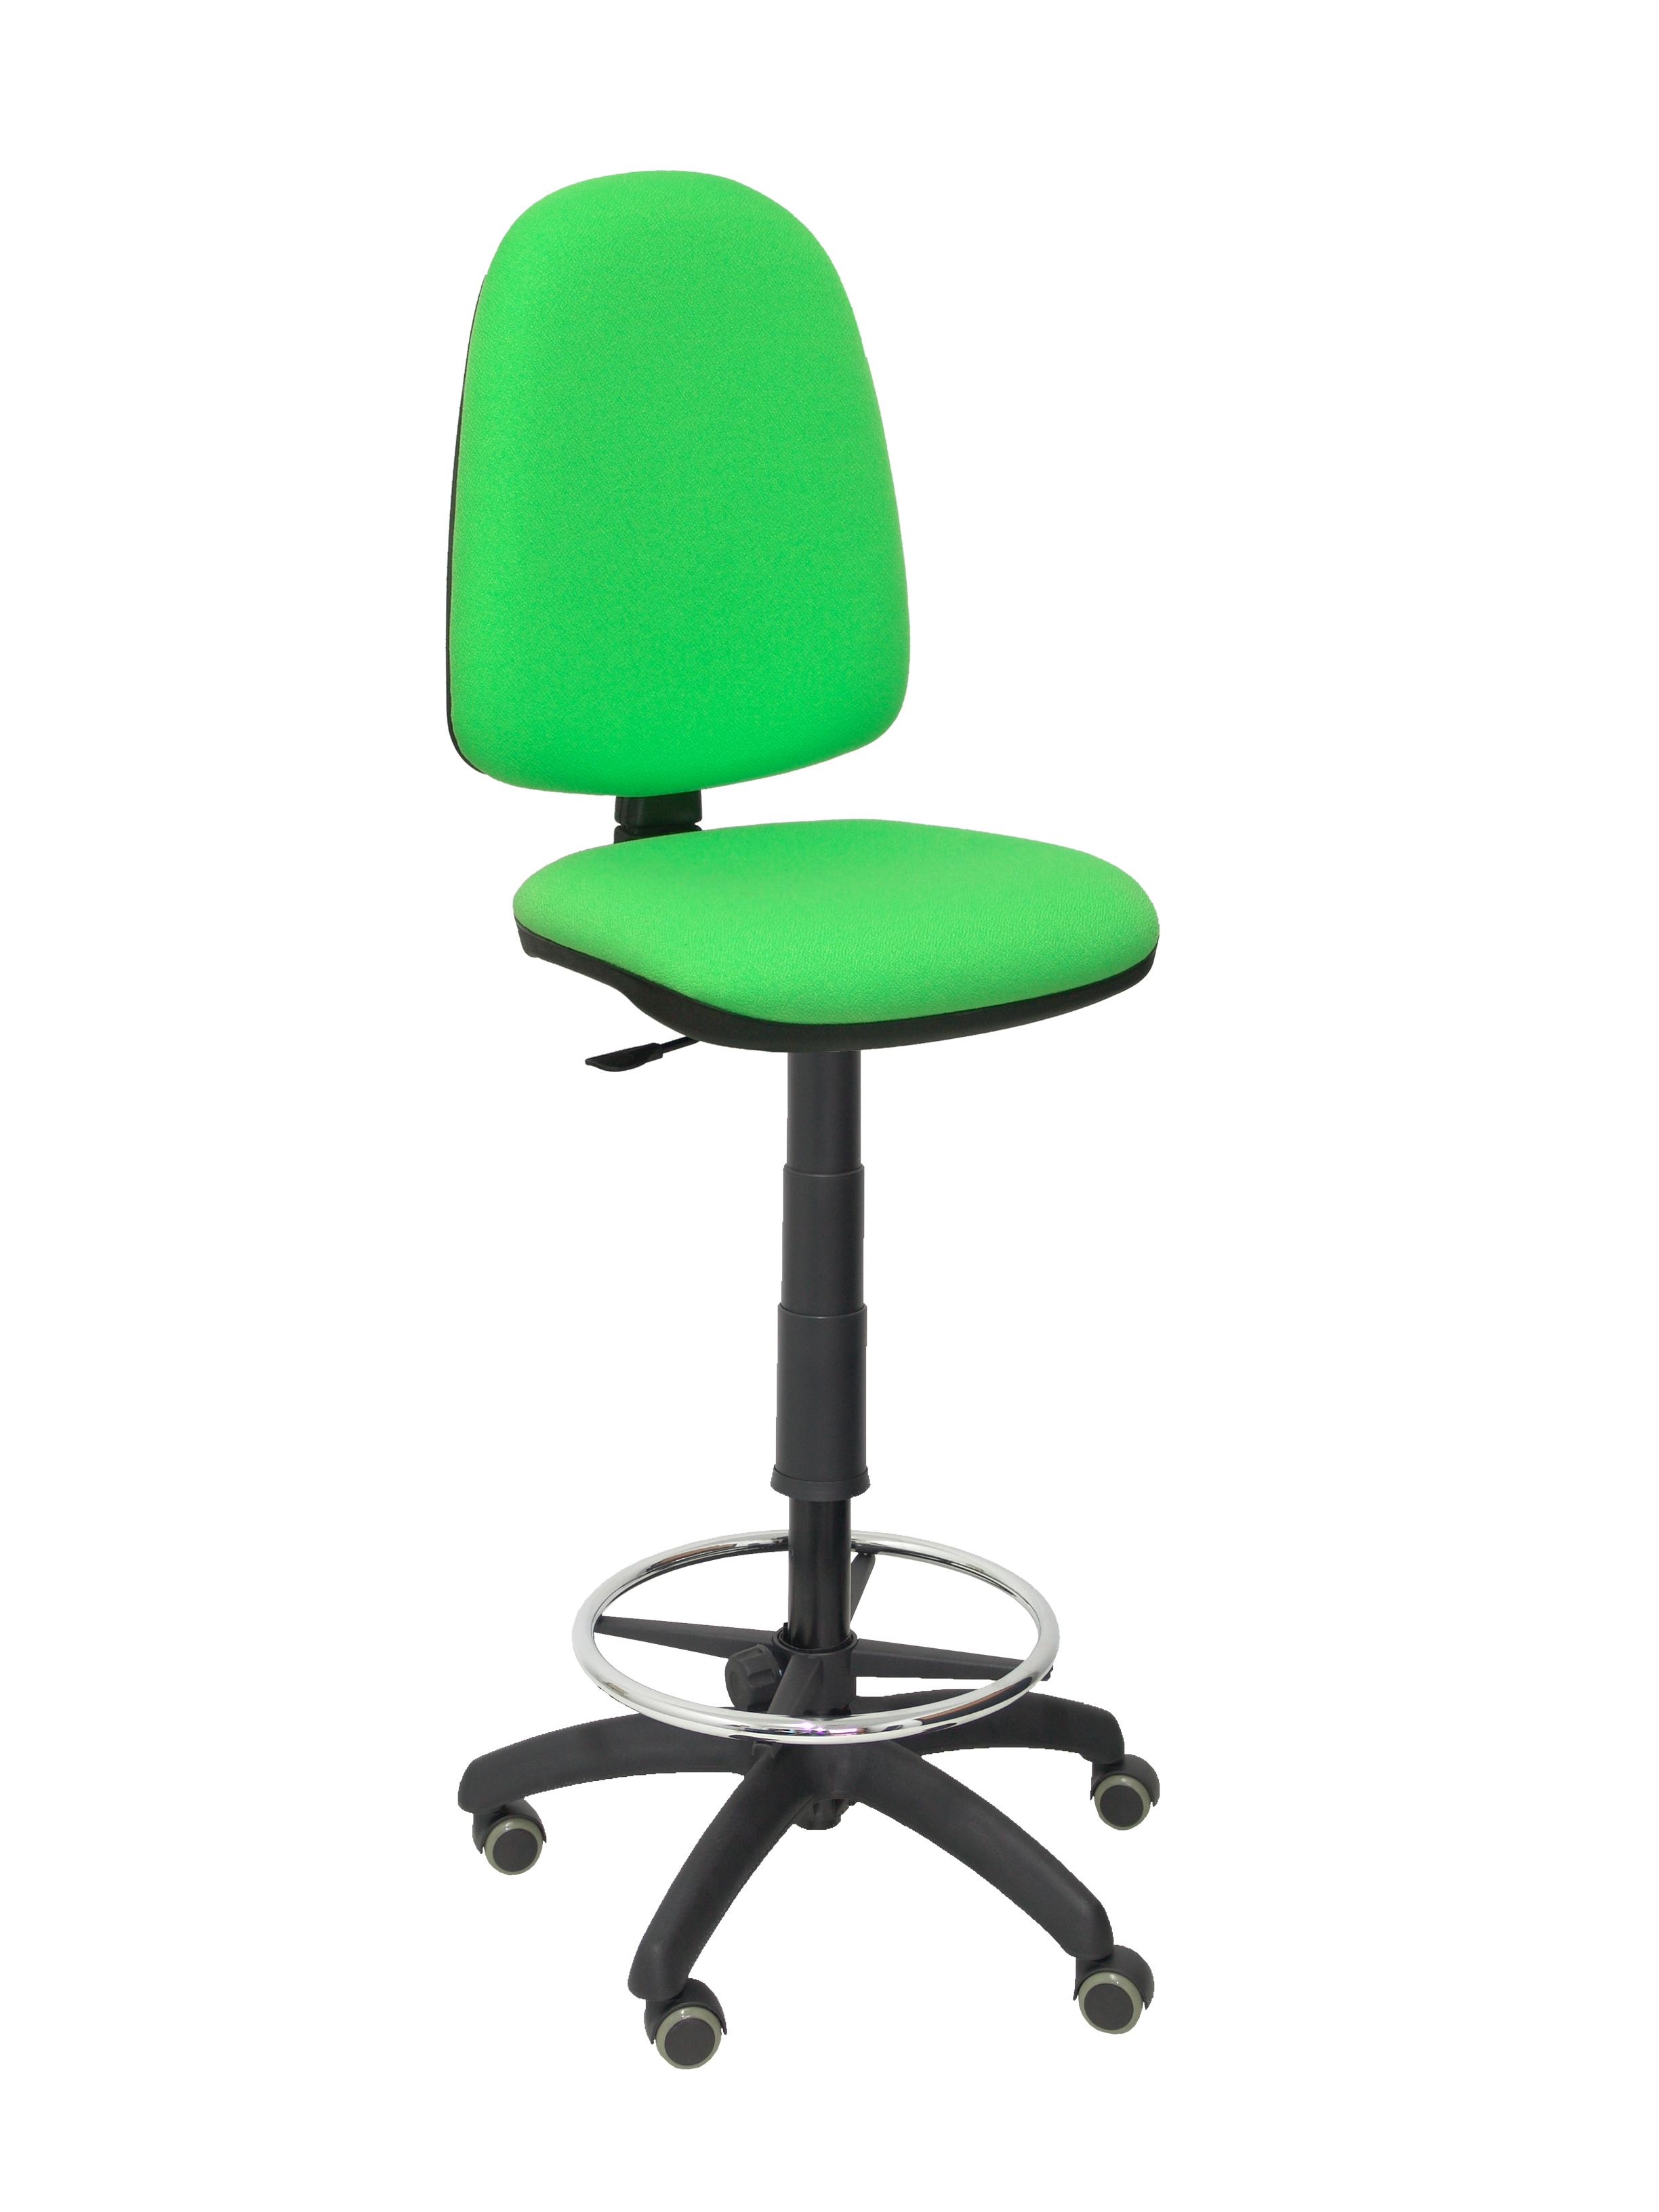 Taburete Ayna bali verde pistacho ruedas de parquet